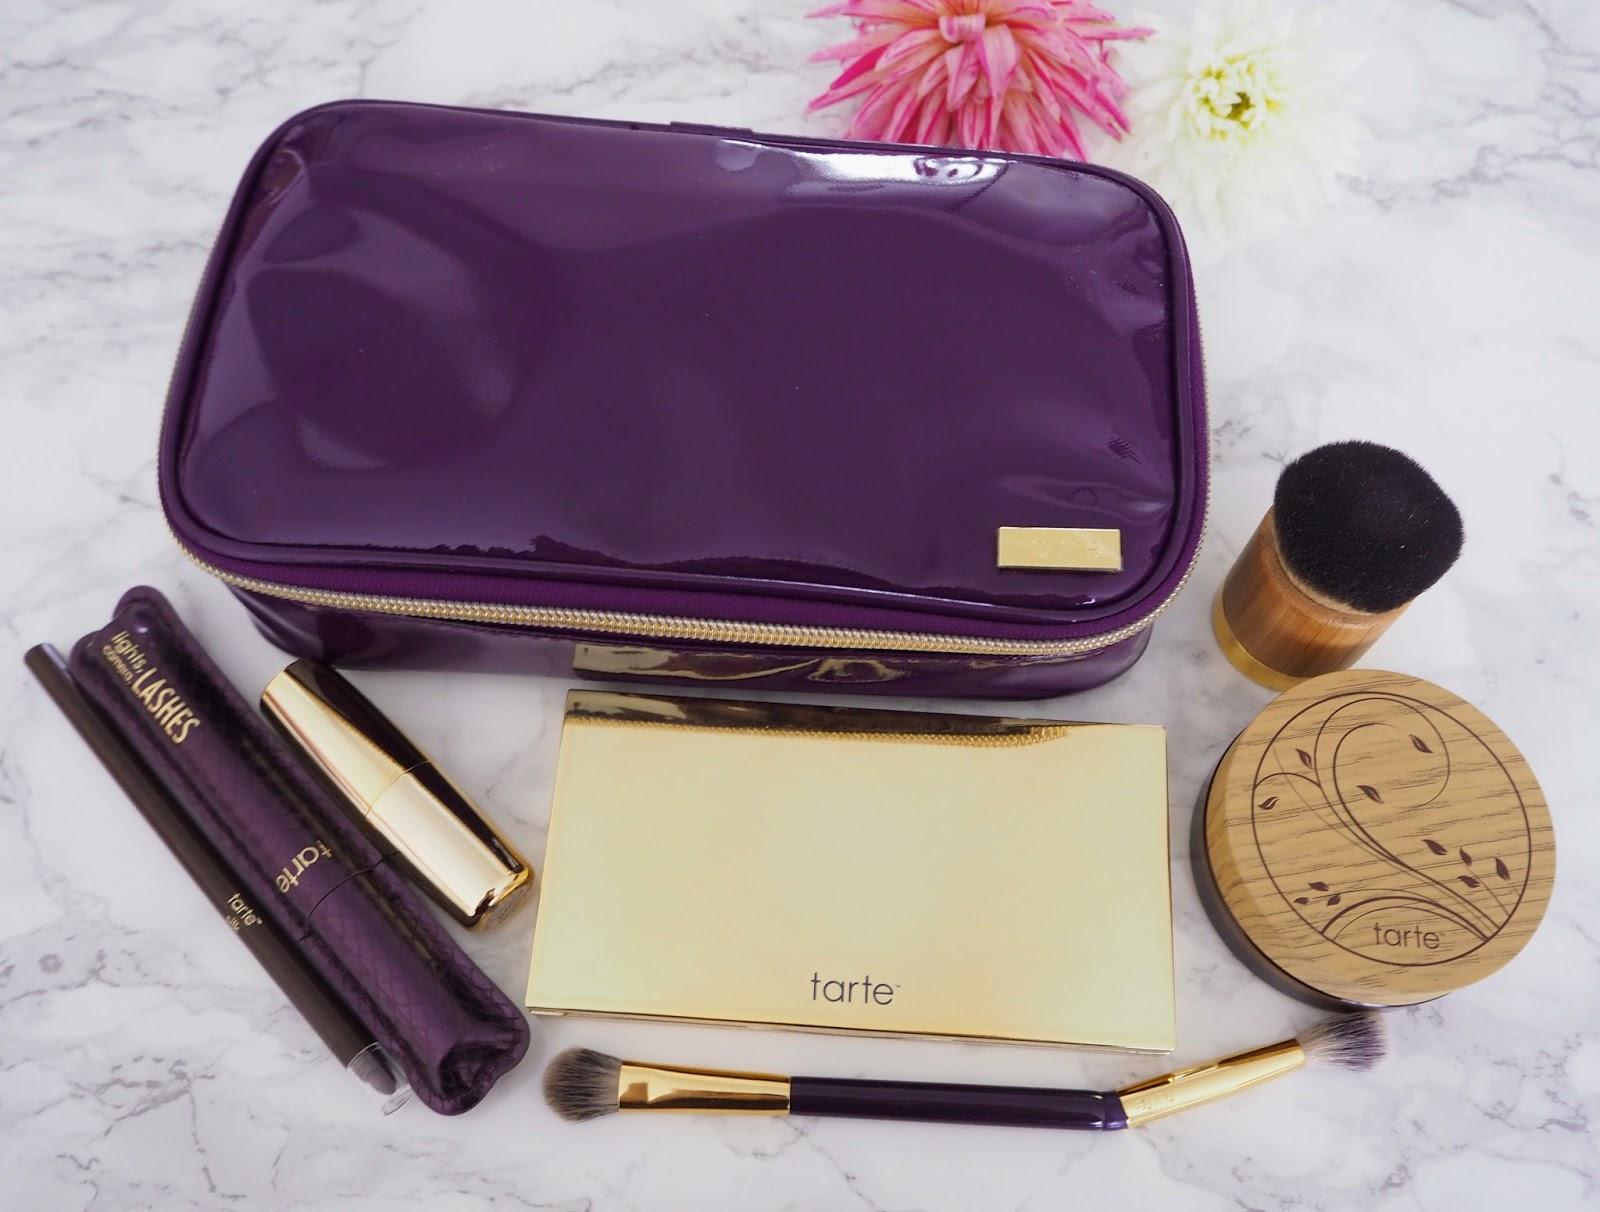 Tarte Cosmetics Makeup Set | Katie Kirk Loves